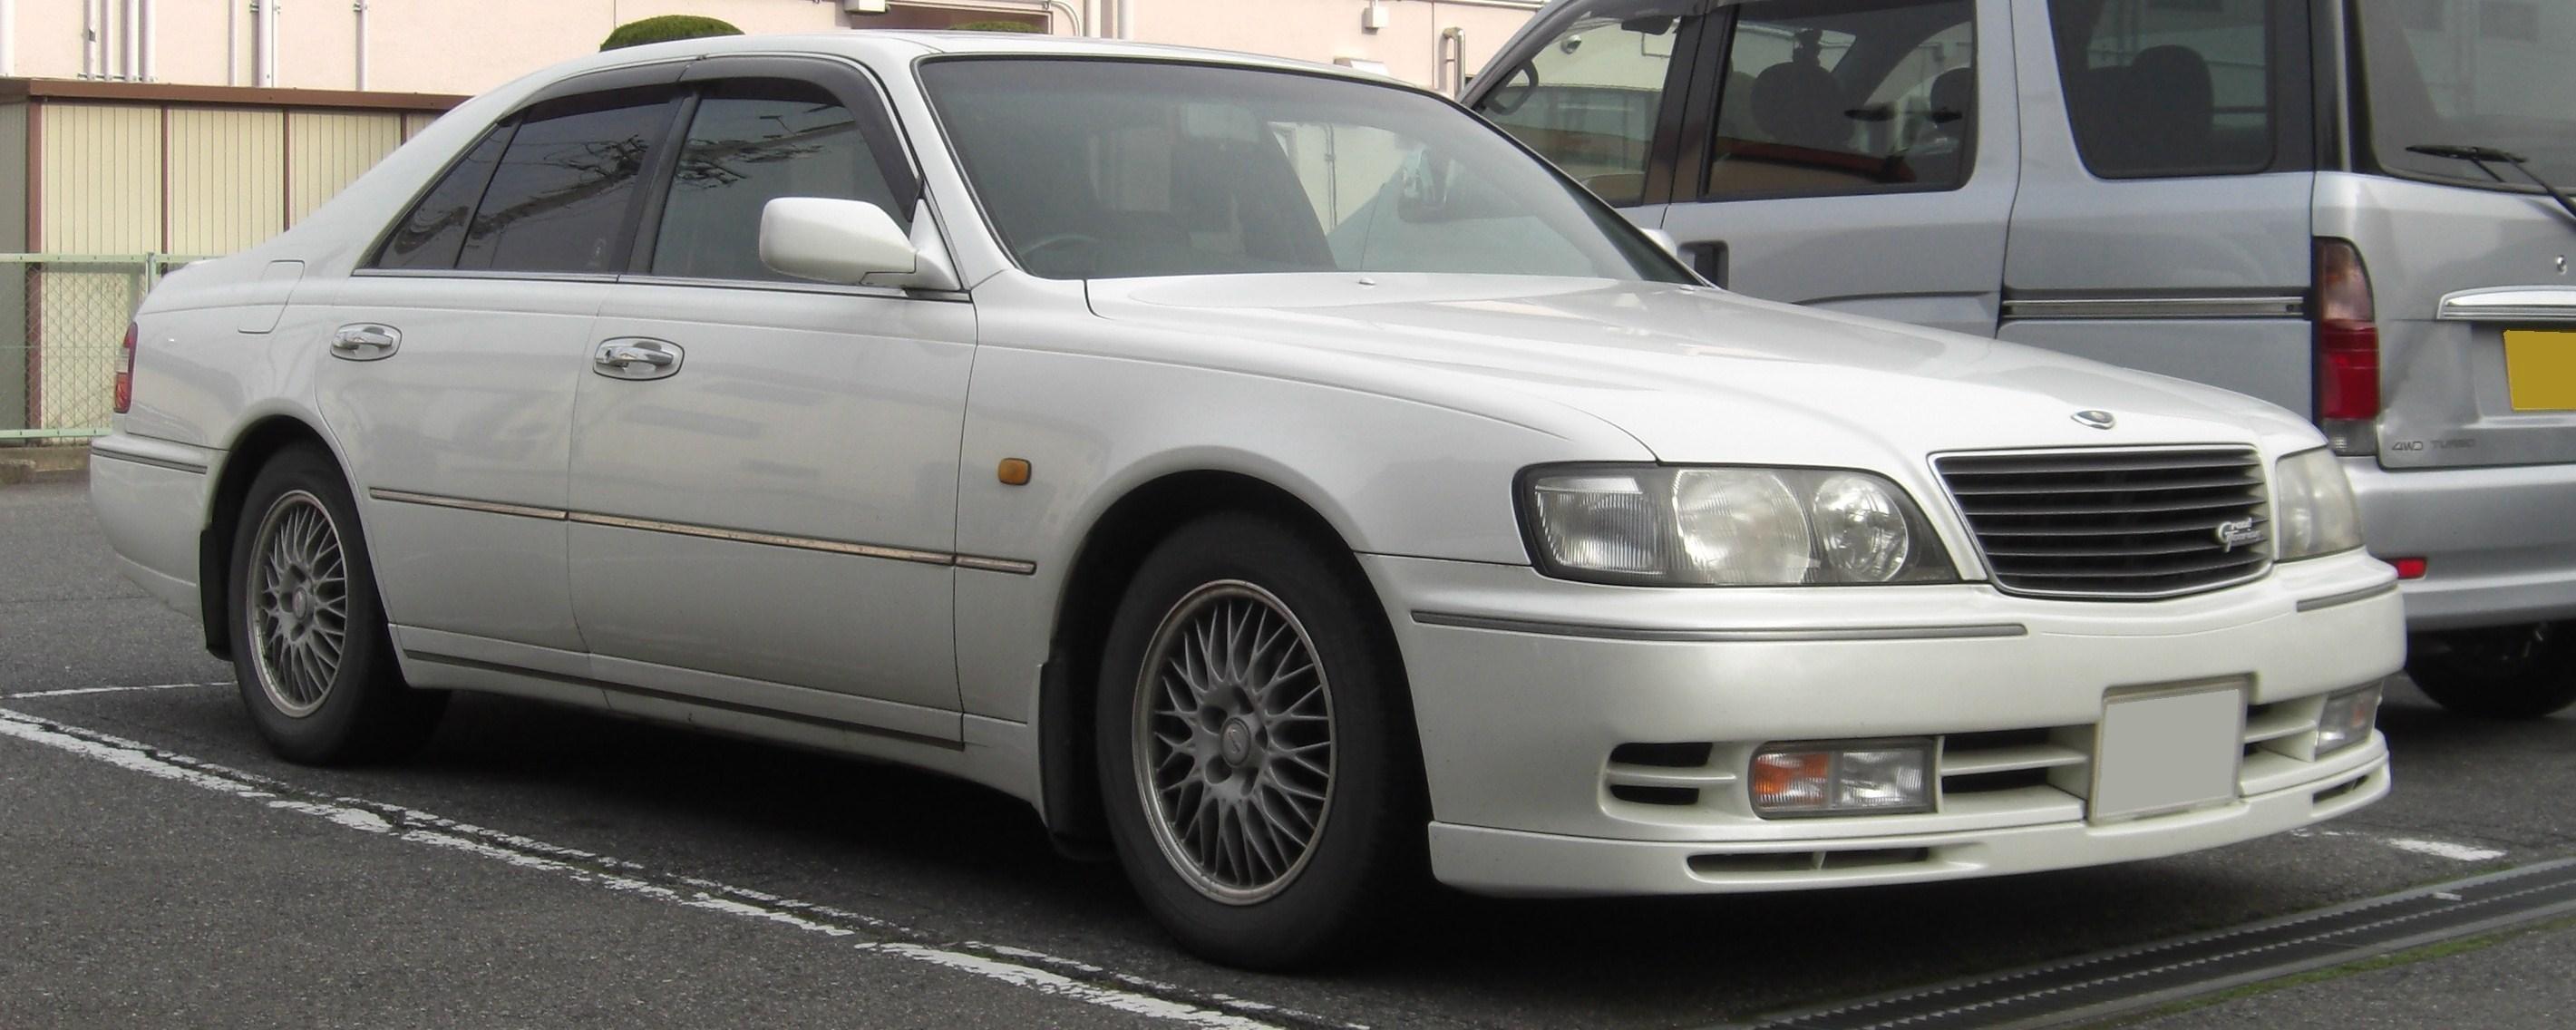 Nissan Cima Grand Touring